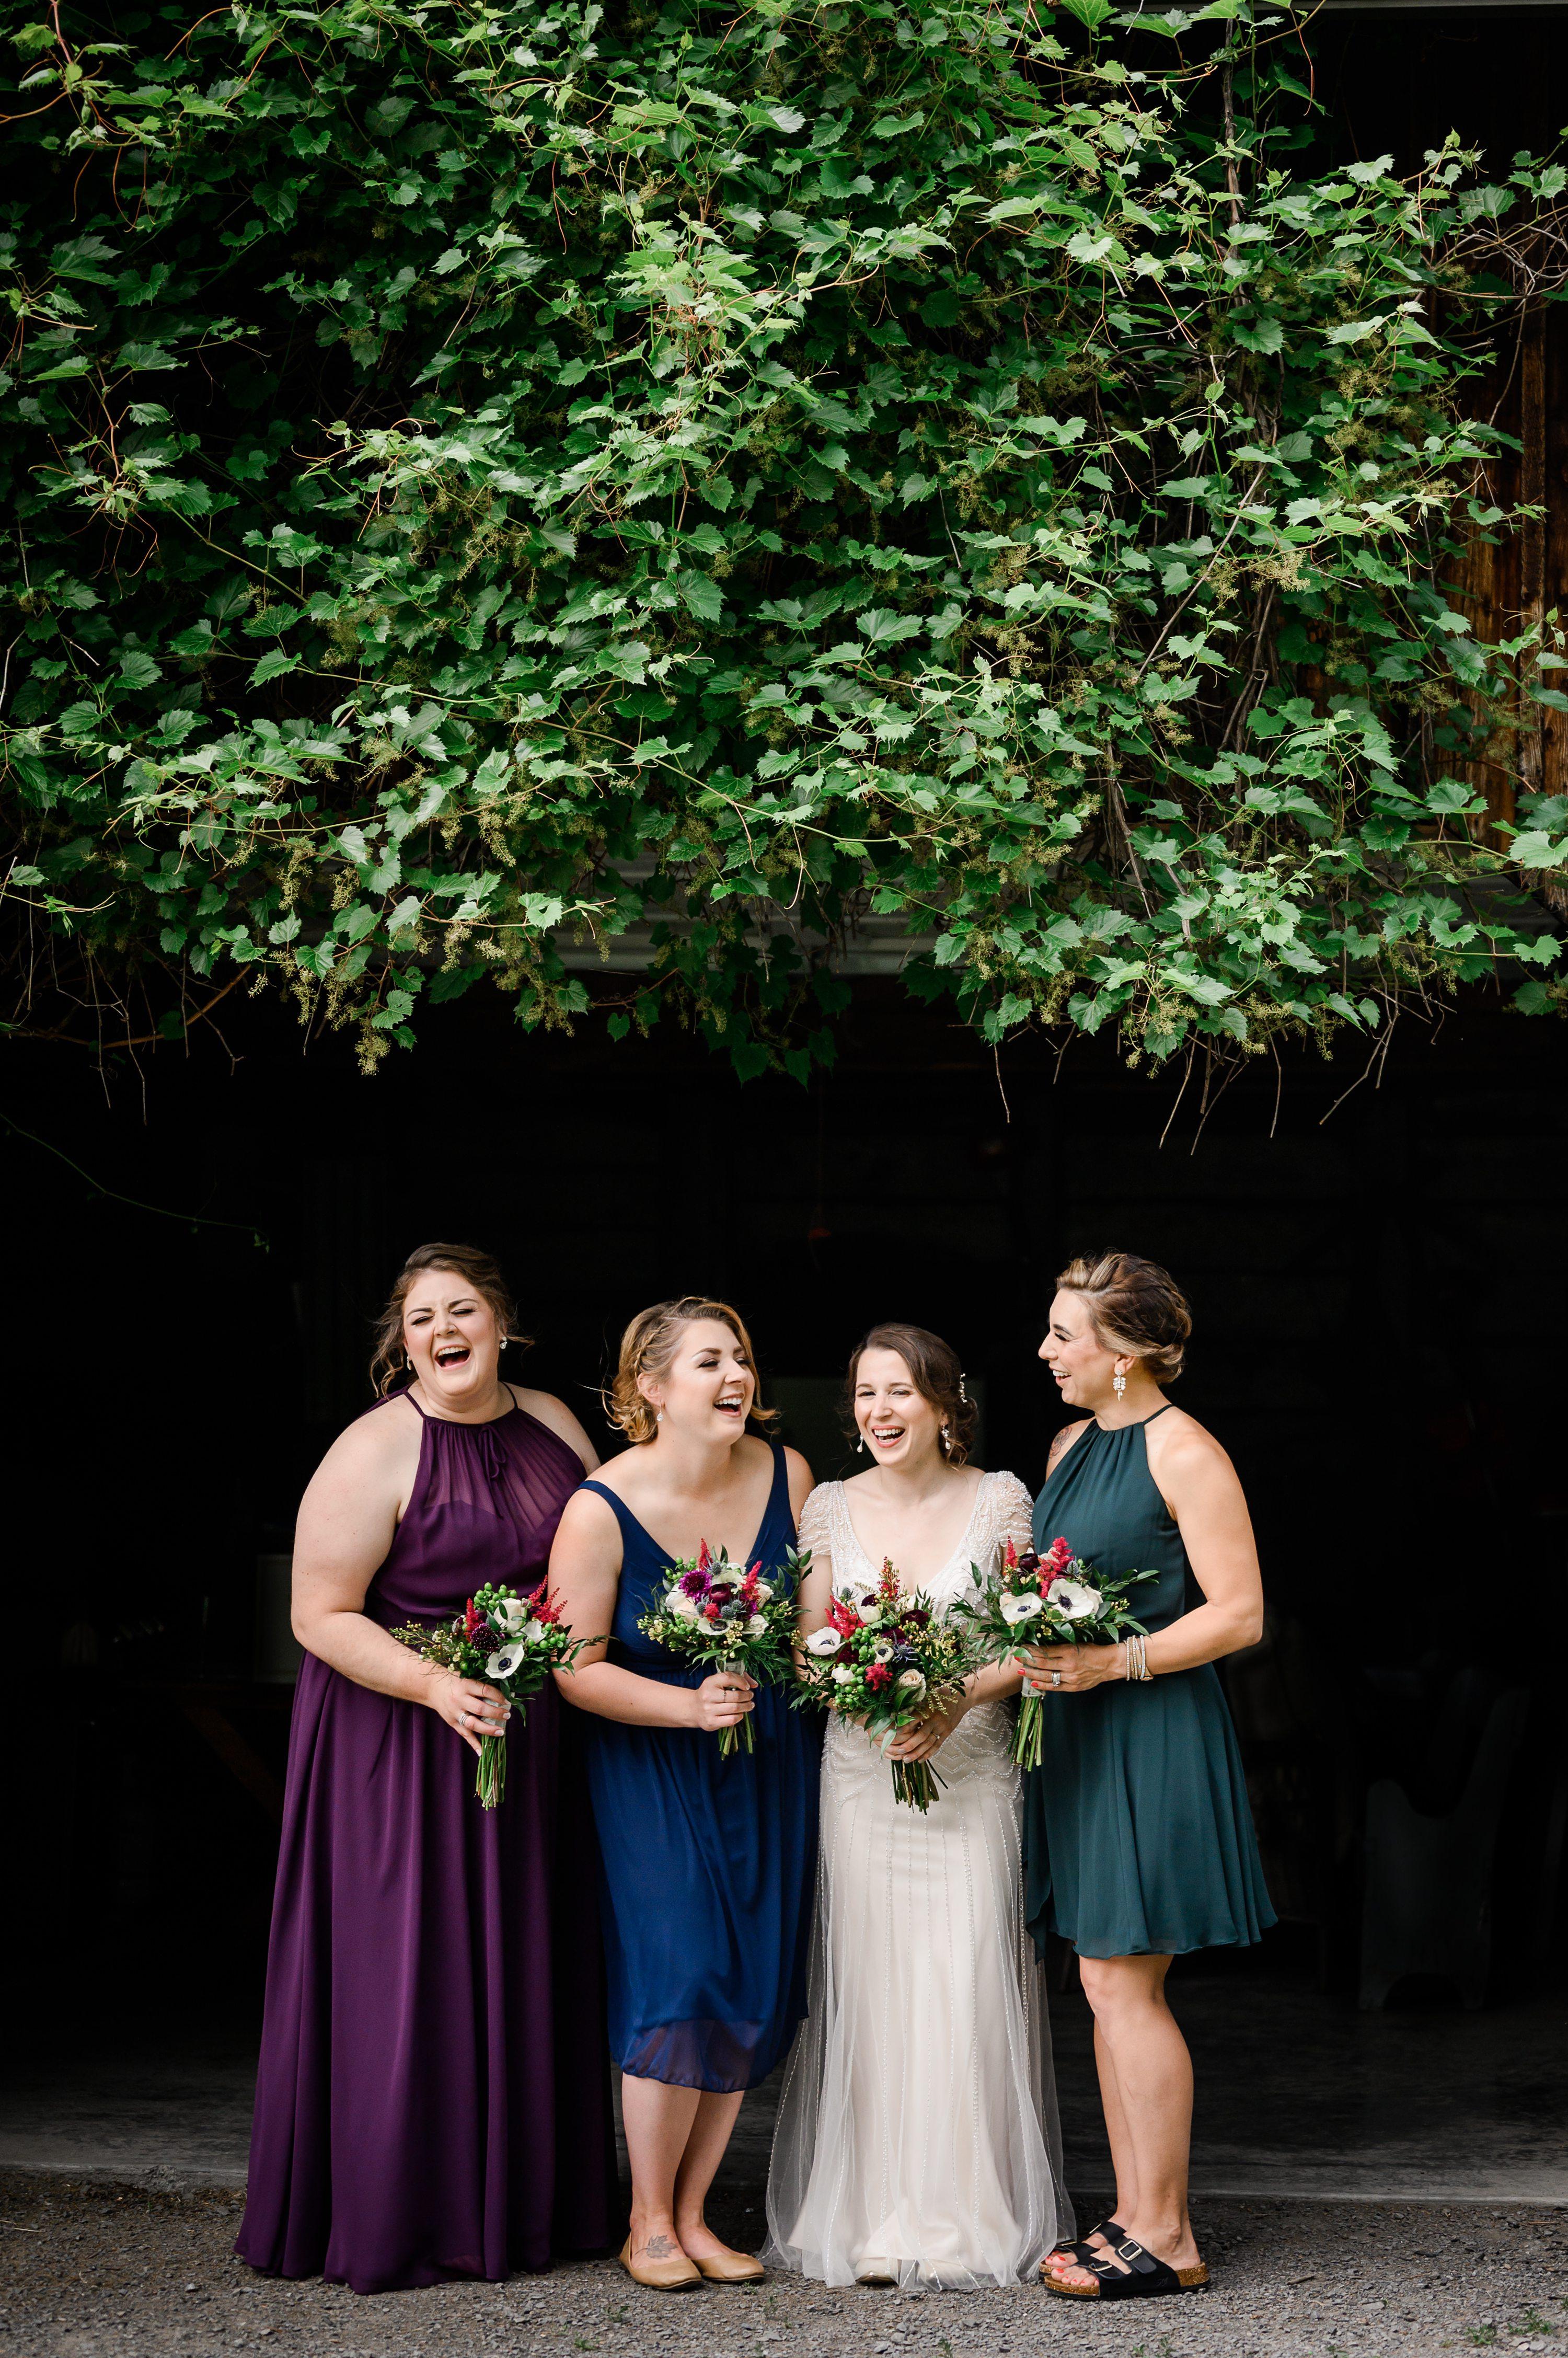 scottish wedding,Mariage écossais